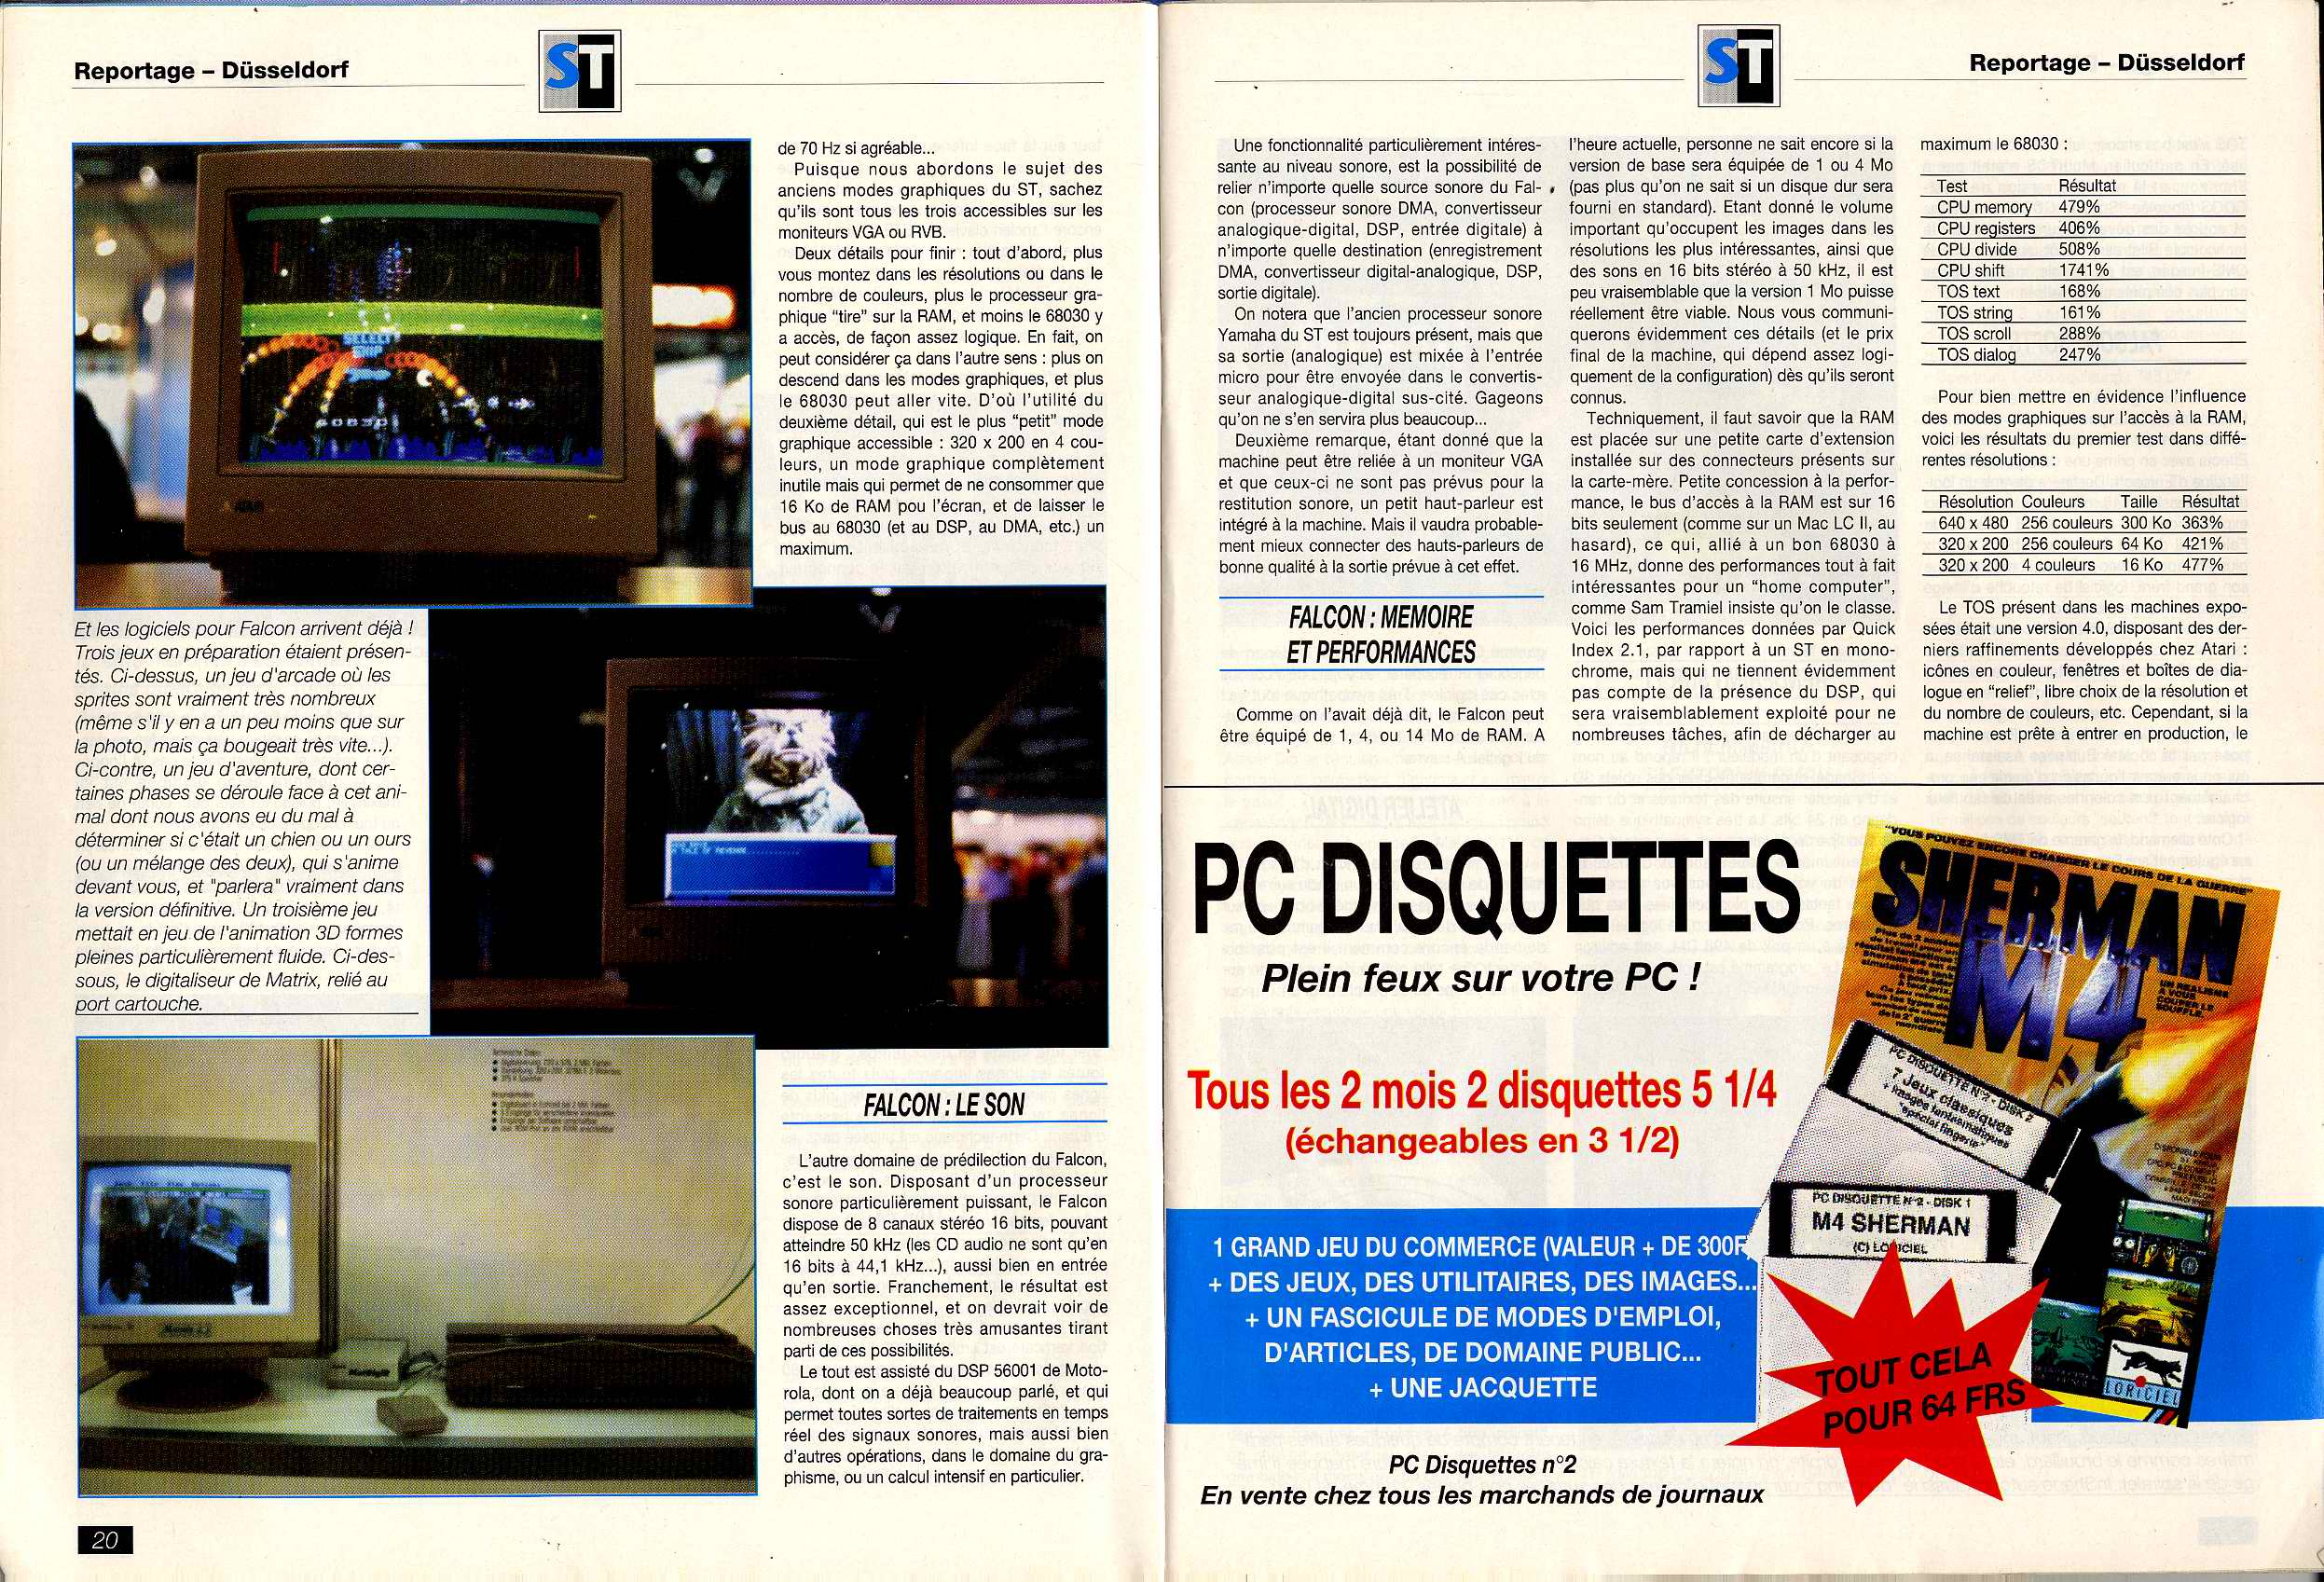 Falcon030 vs Amiga 1200 - Page 2 St%20magazine%20-%20N065%20-%20octobre%201992%20-%20page020%20et%20021